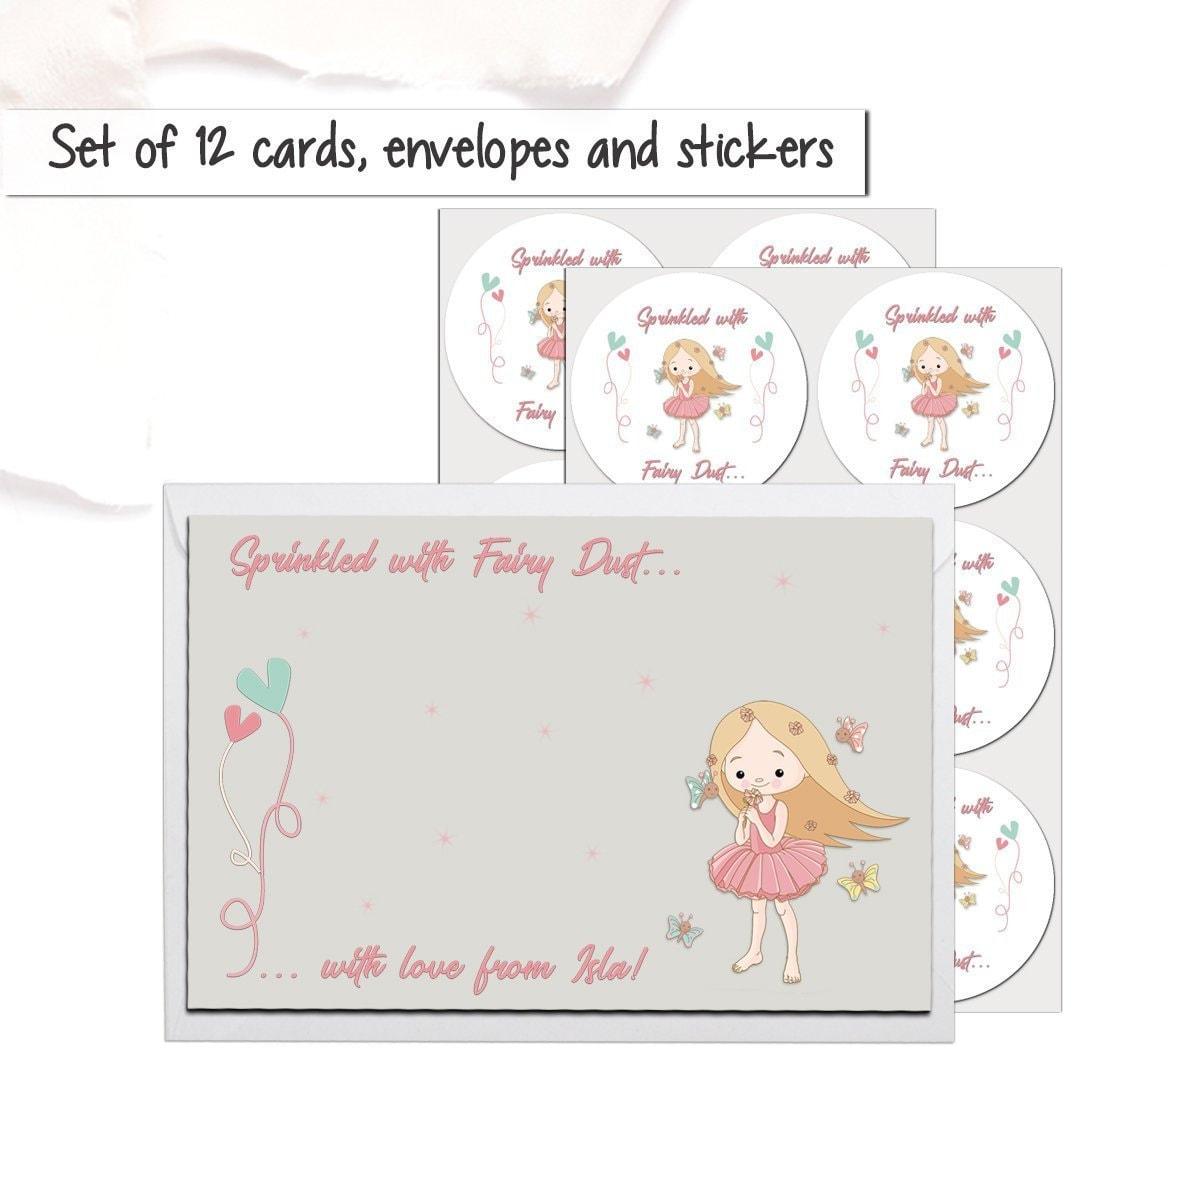 Thank you Greeting Card Set 12 Envelopes +Sticker Set of 12 Greeting Cards